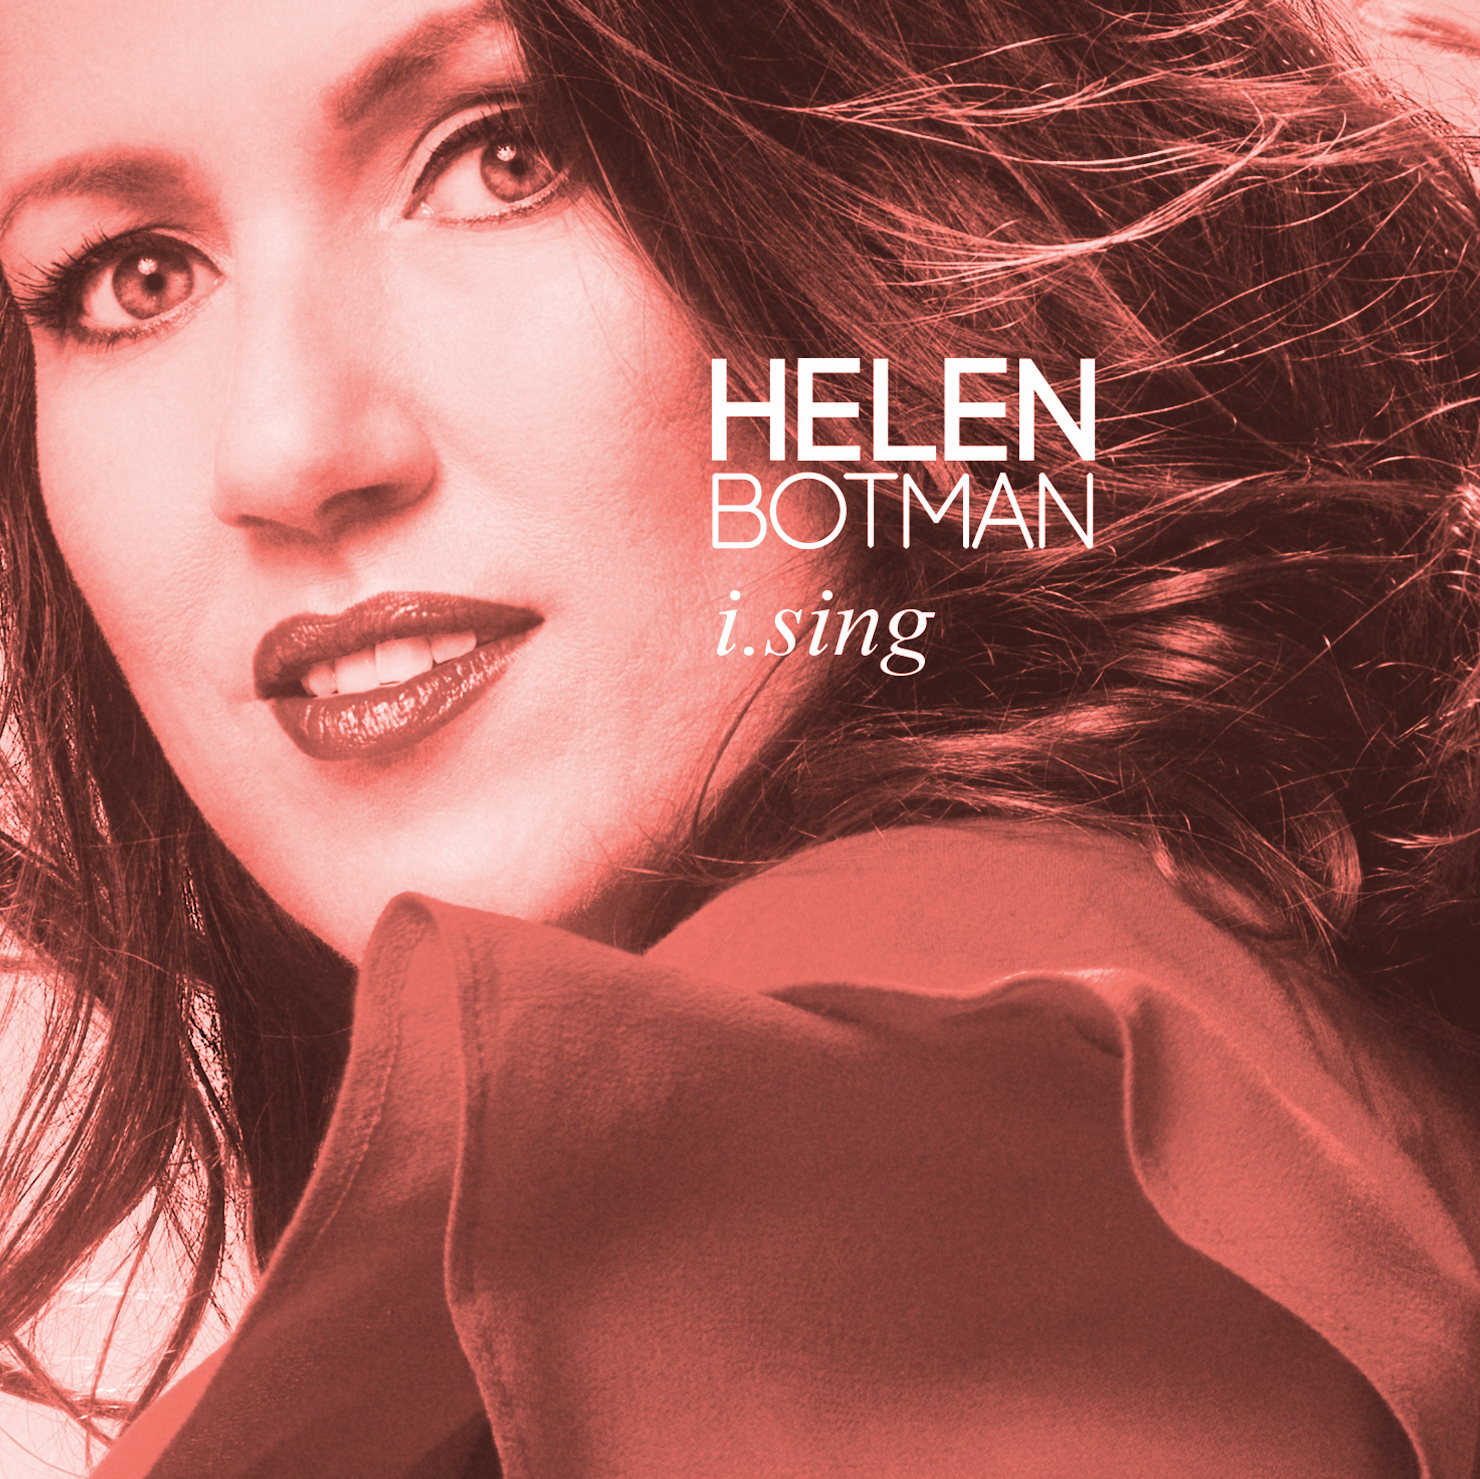 I Sing (album download)